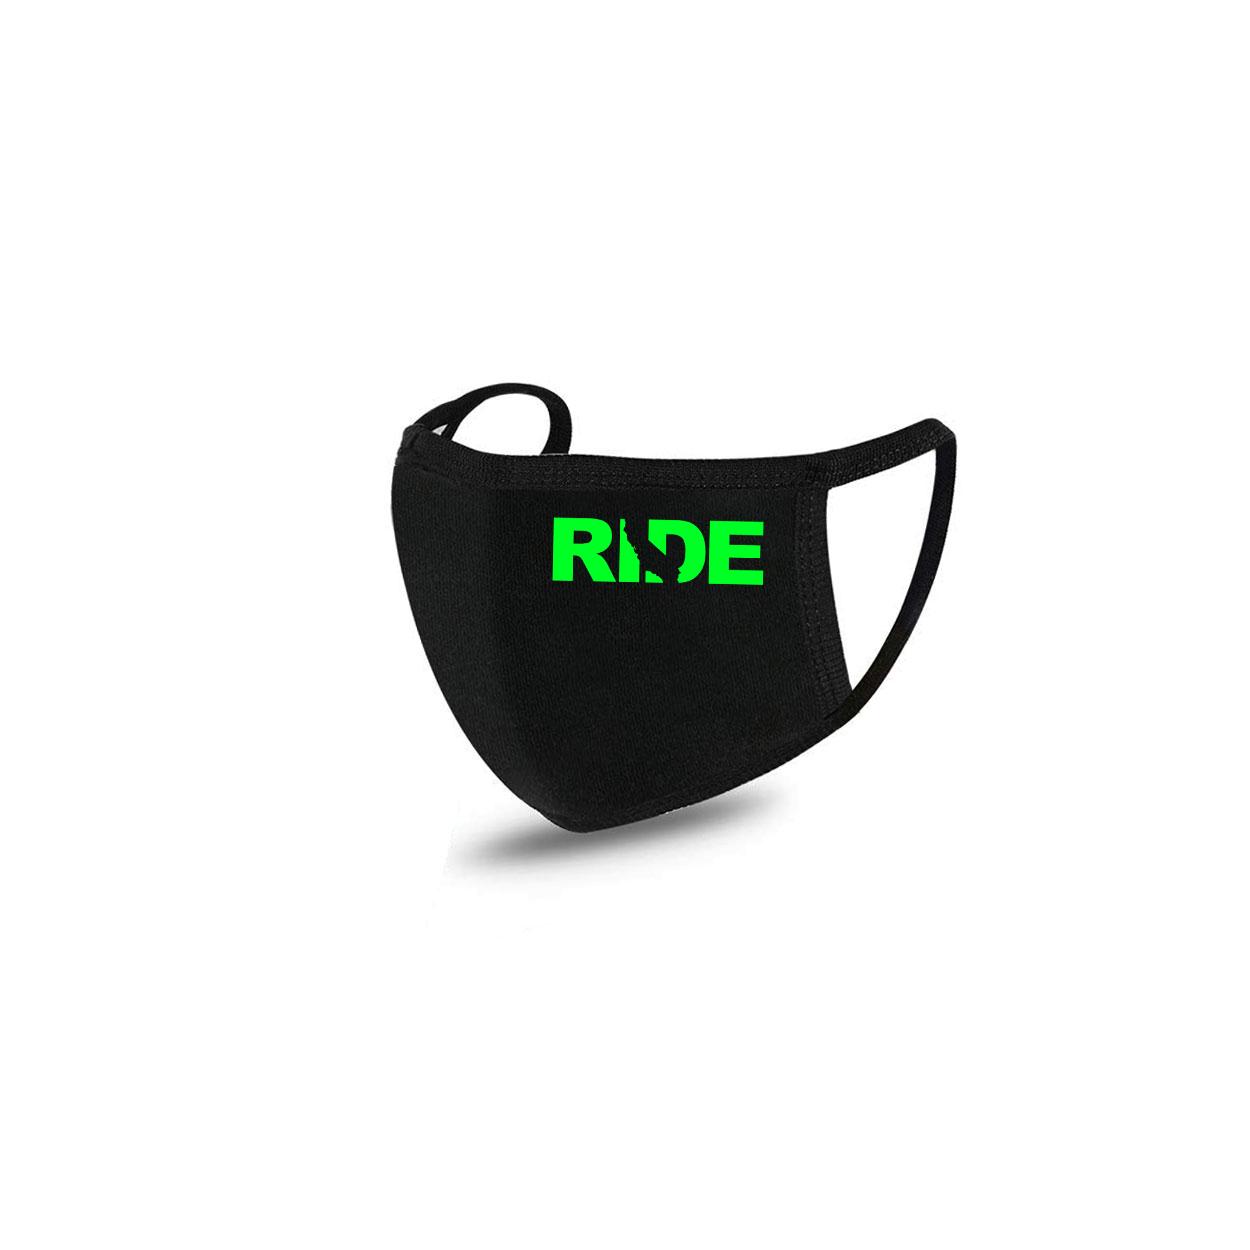 Ride California Standard Washable Face Mask Black (Green Logo)